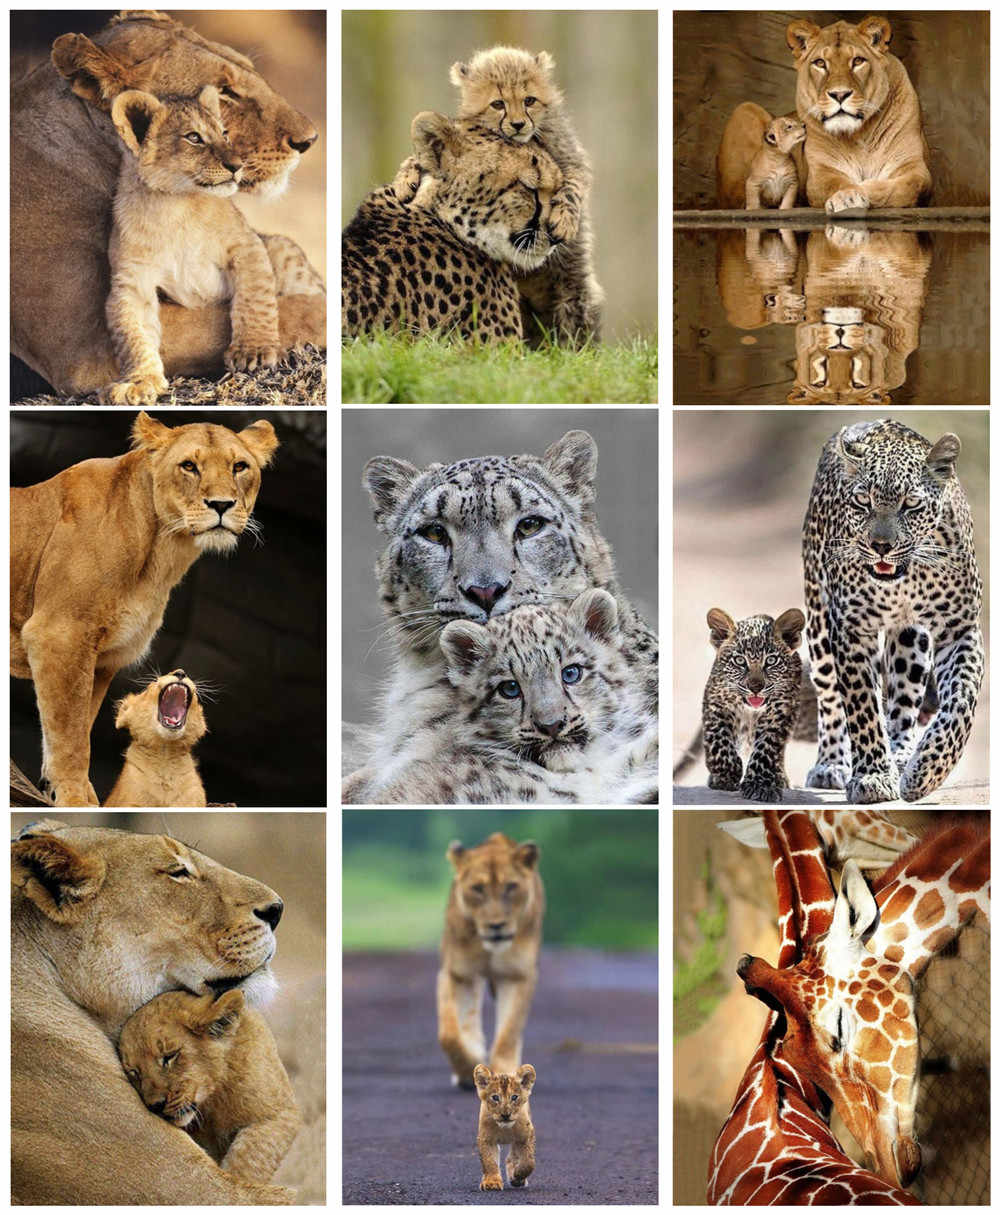 Hewan Liar 5D Lukisan Berlian Tiger Lion Cross Stitch Kit Buatan Tangan Ibu Cinta Stiker Dinding Diamond Bordir Lukisan